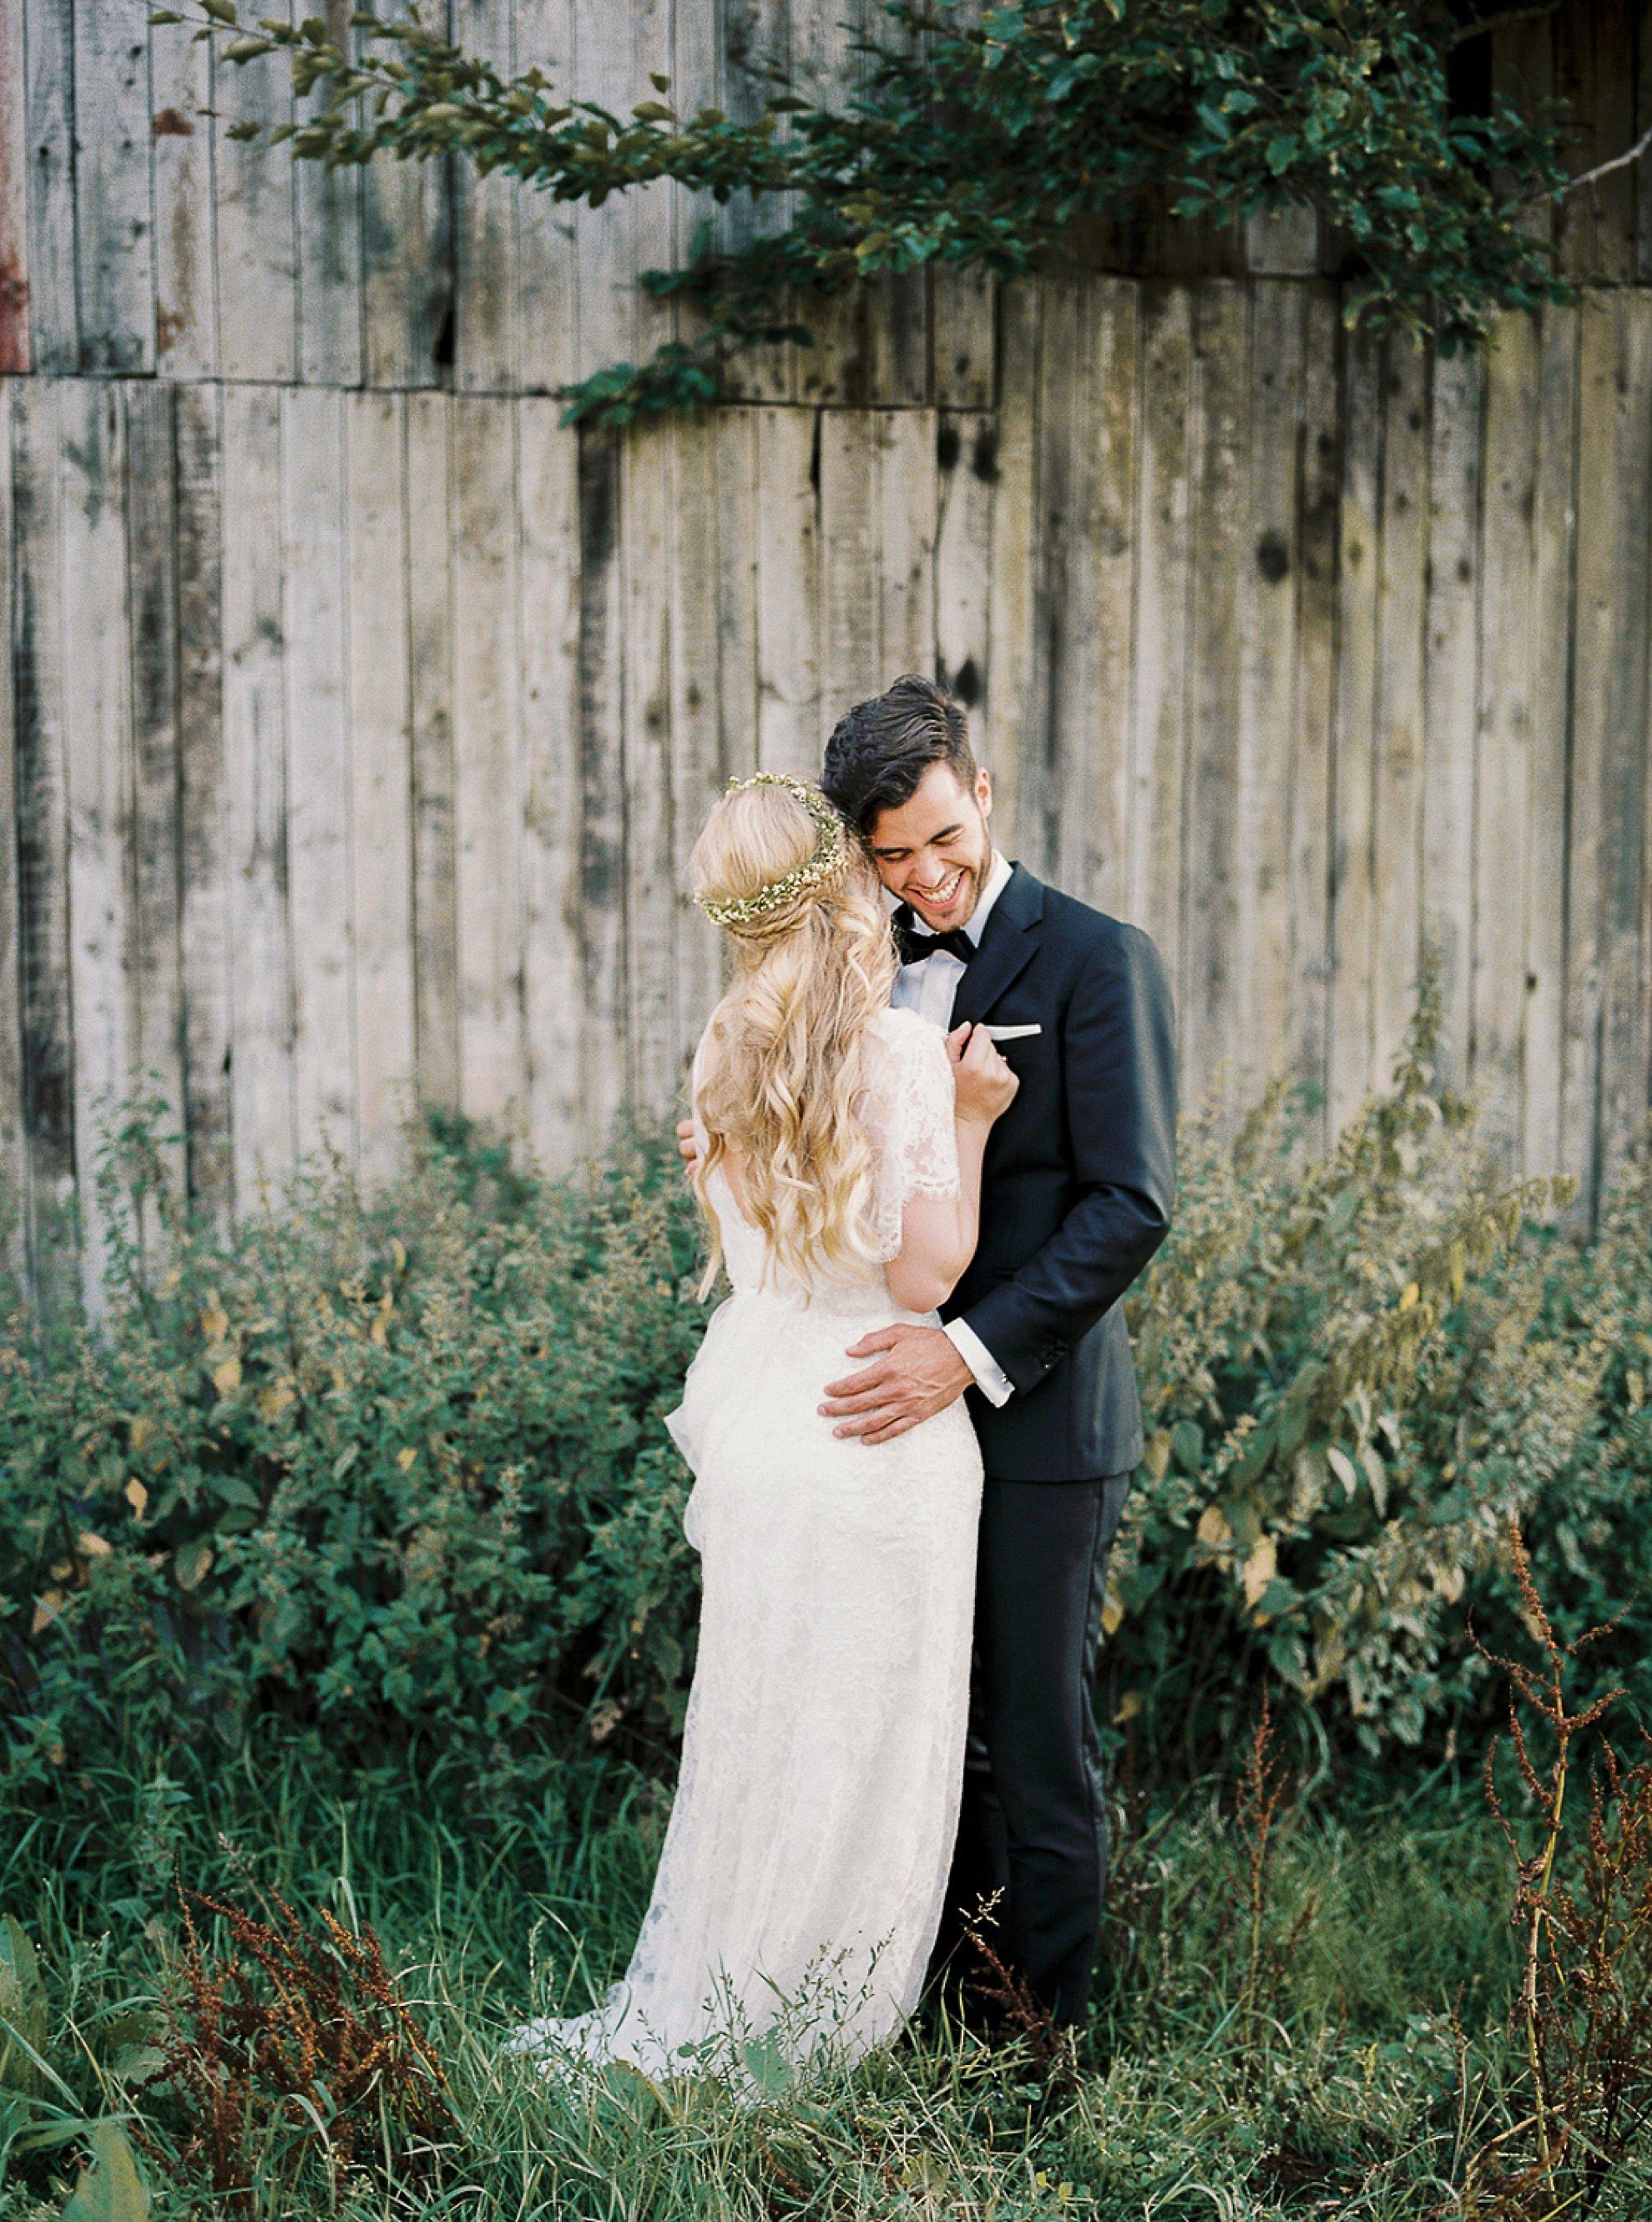 Amanda-Drost-Fotografie-Belgie-Photography-Wedding_0004.jpg